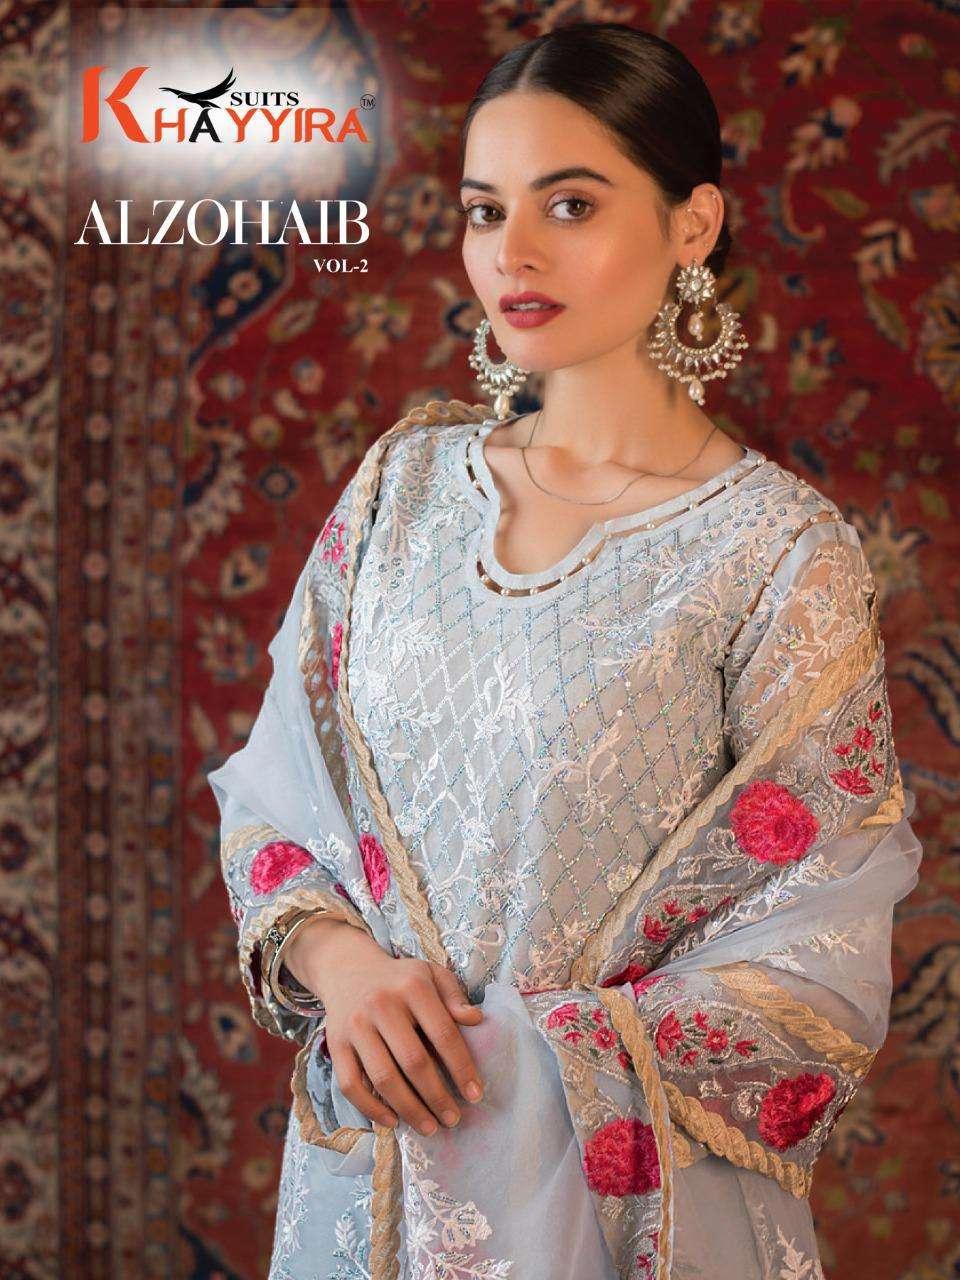 khayyira alzohaib vol 2 pakistani concept of salwar kameez